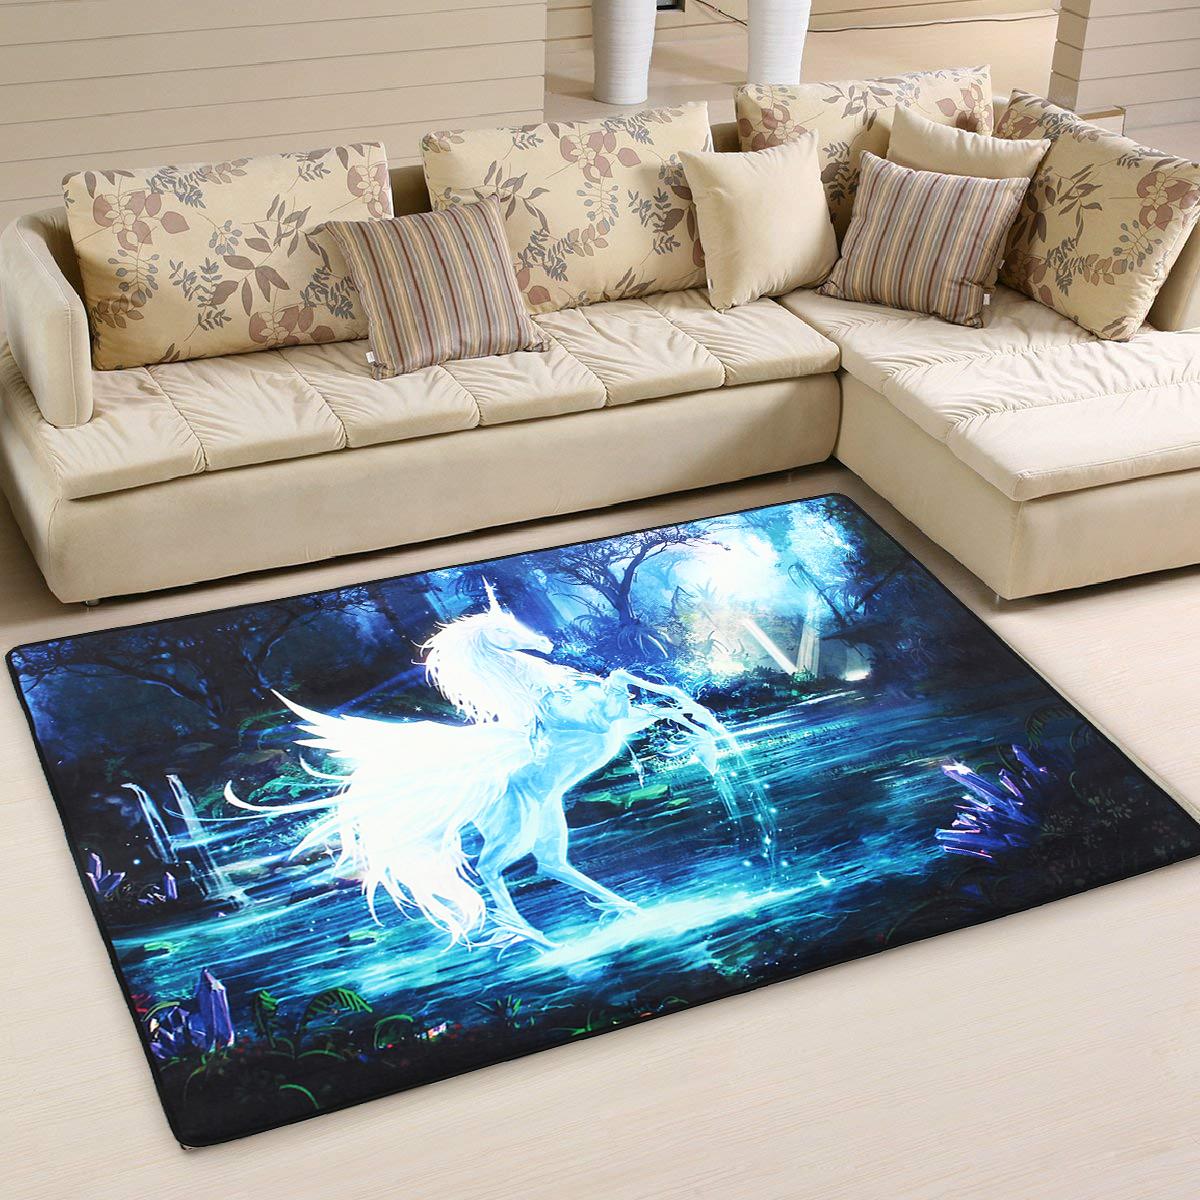 Fashion Non-Slip Shaggy Fluffy Area Rug Floor Mat Living Room Carpet Home Decoration